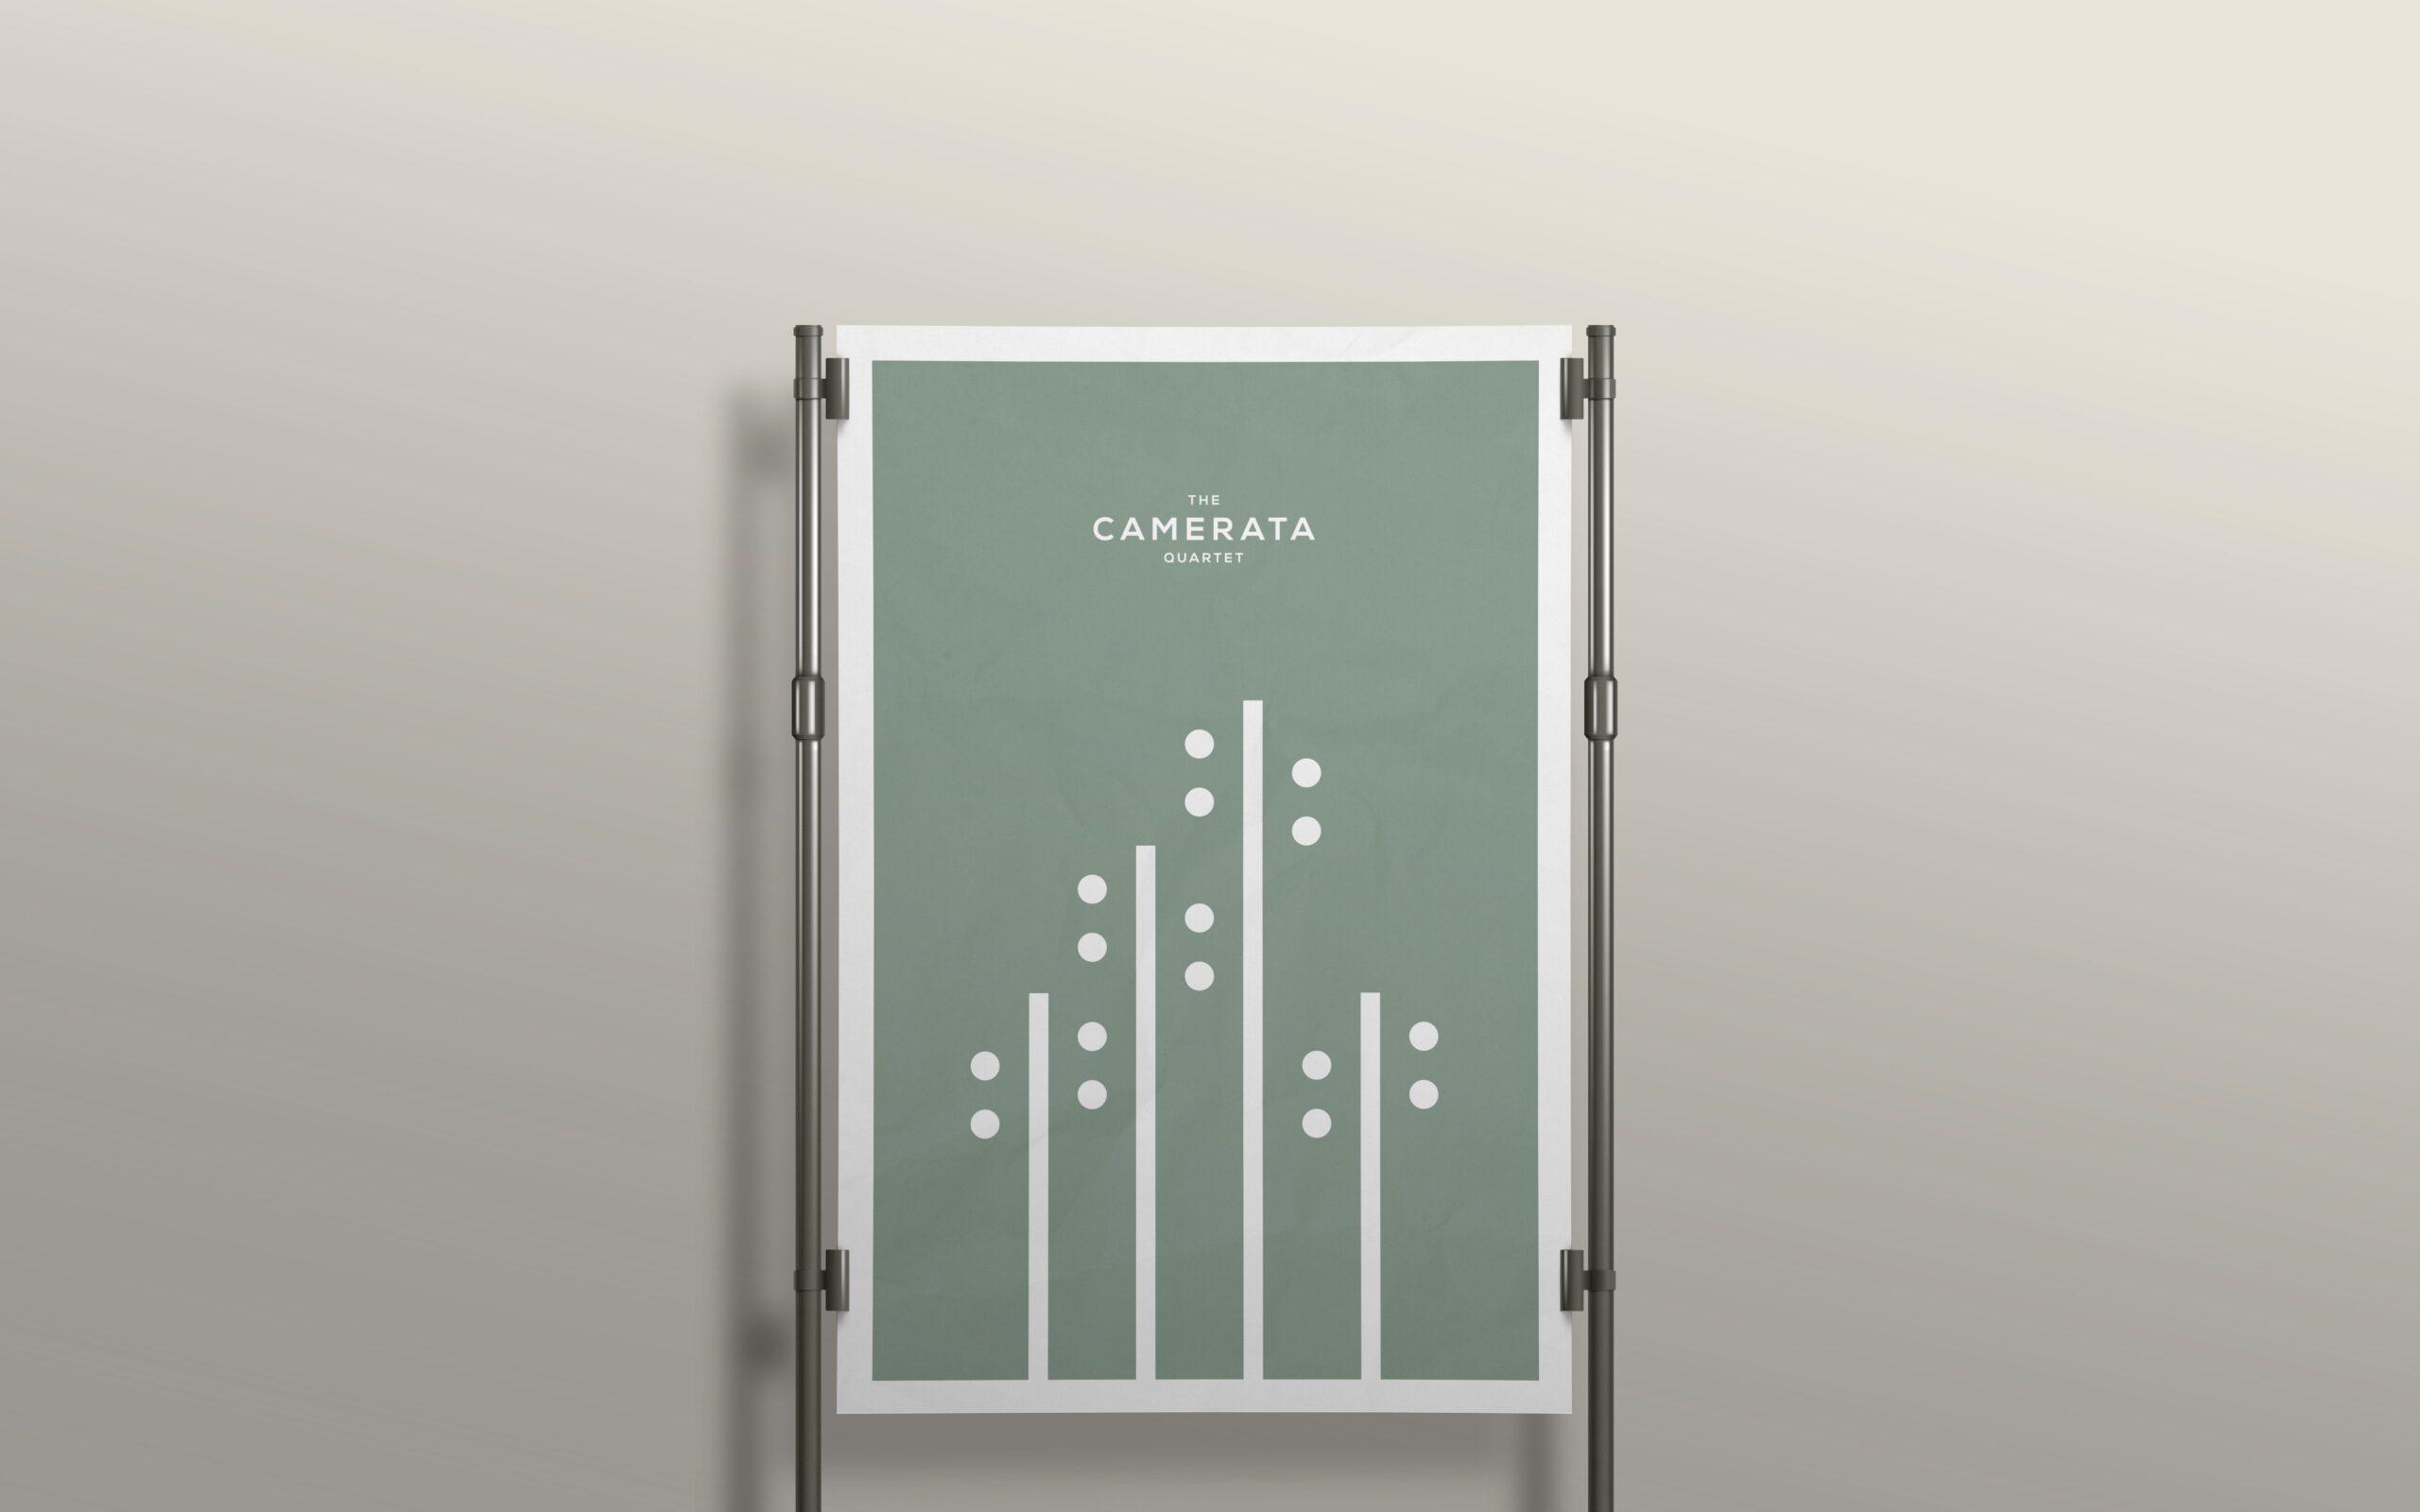 camerata_06